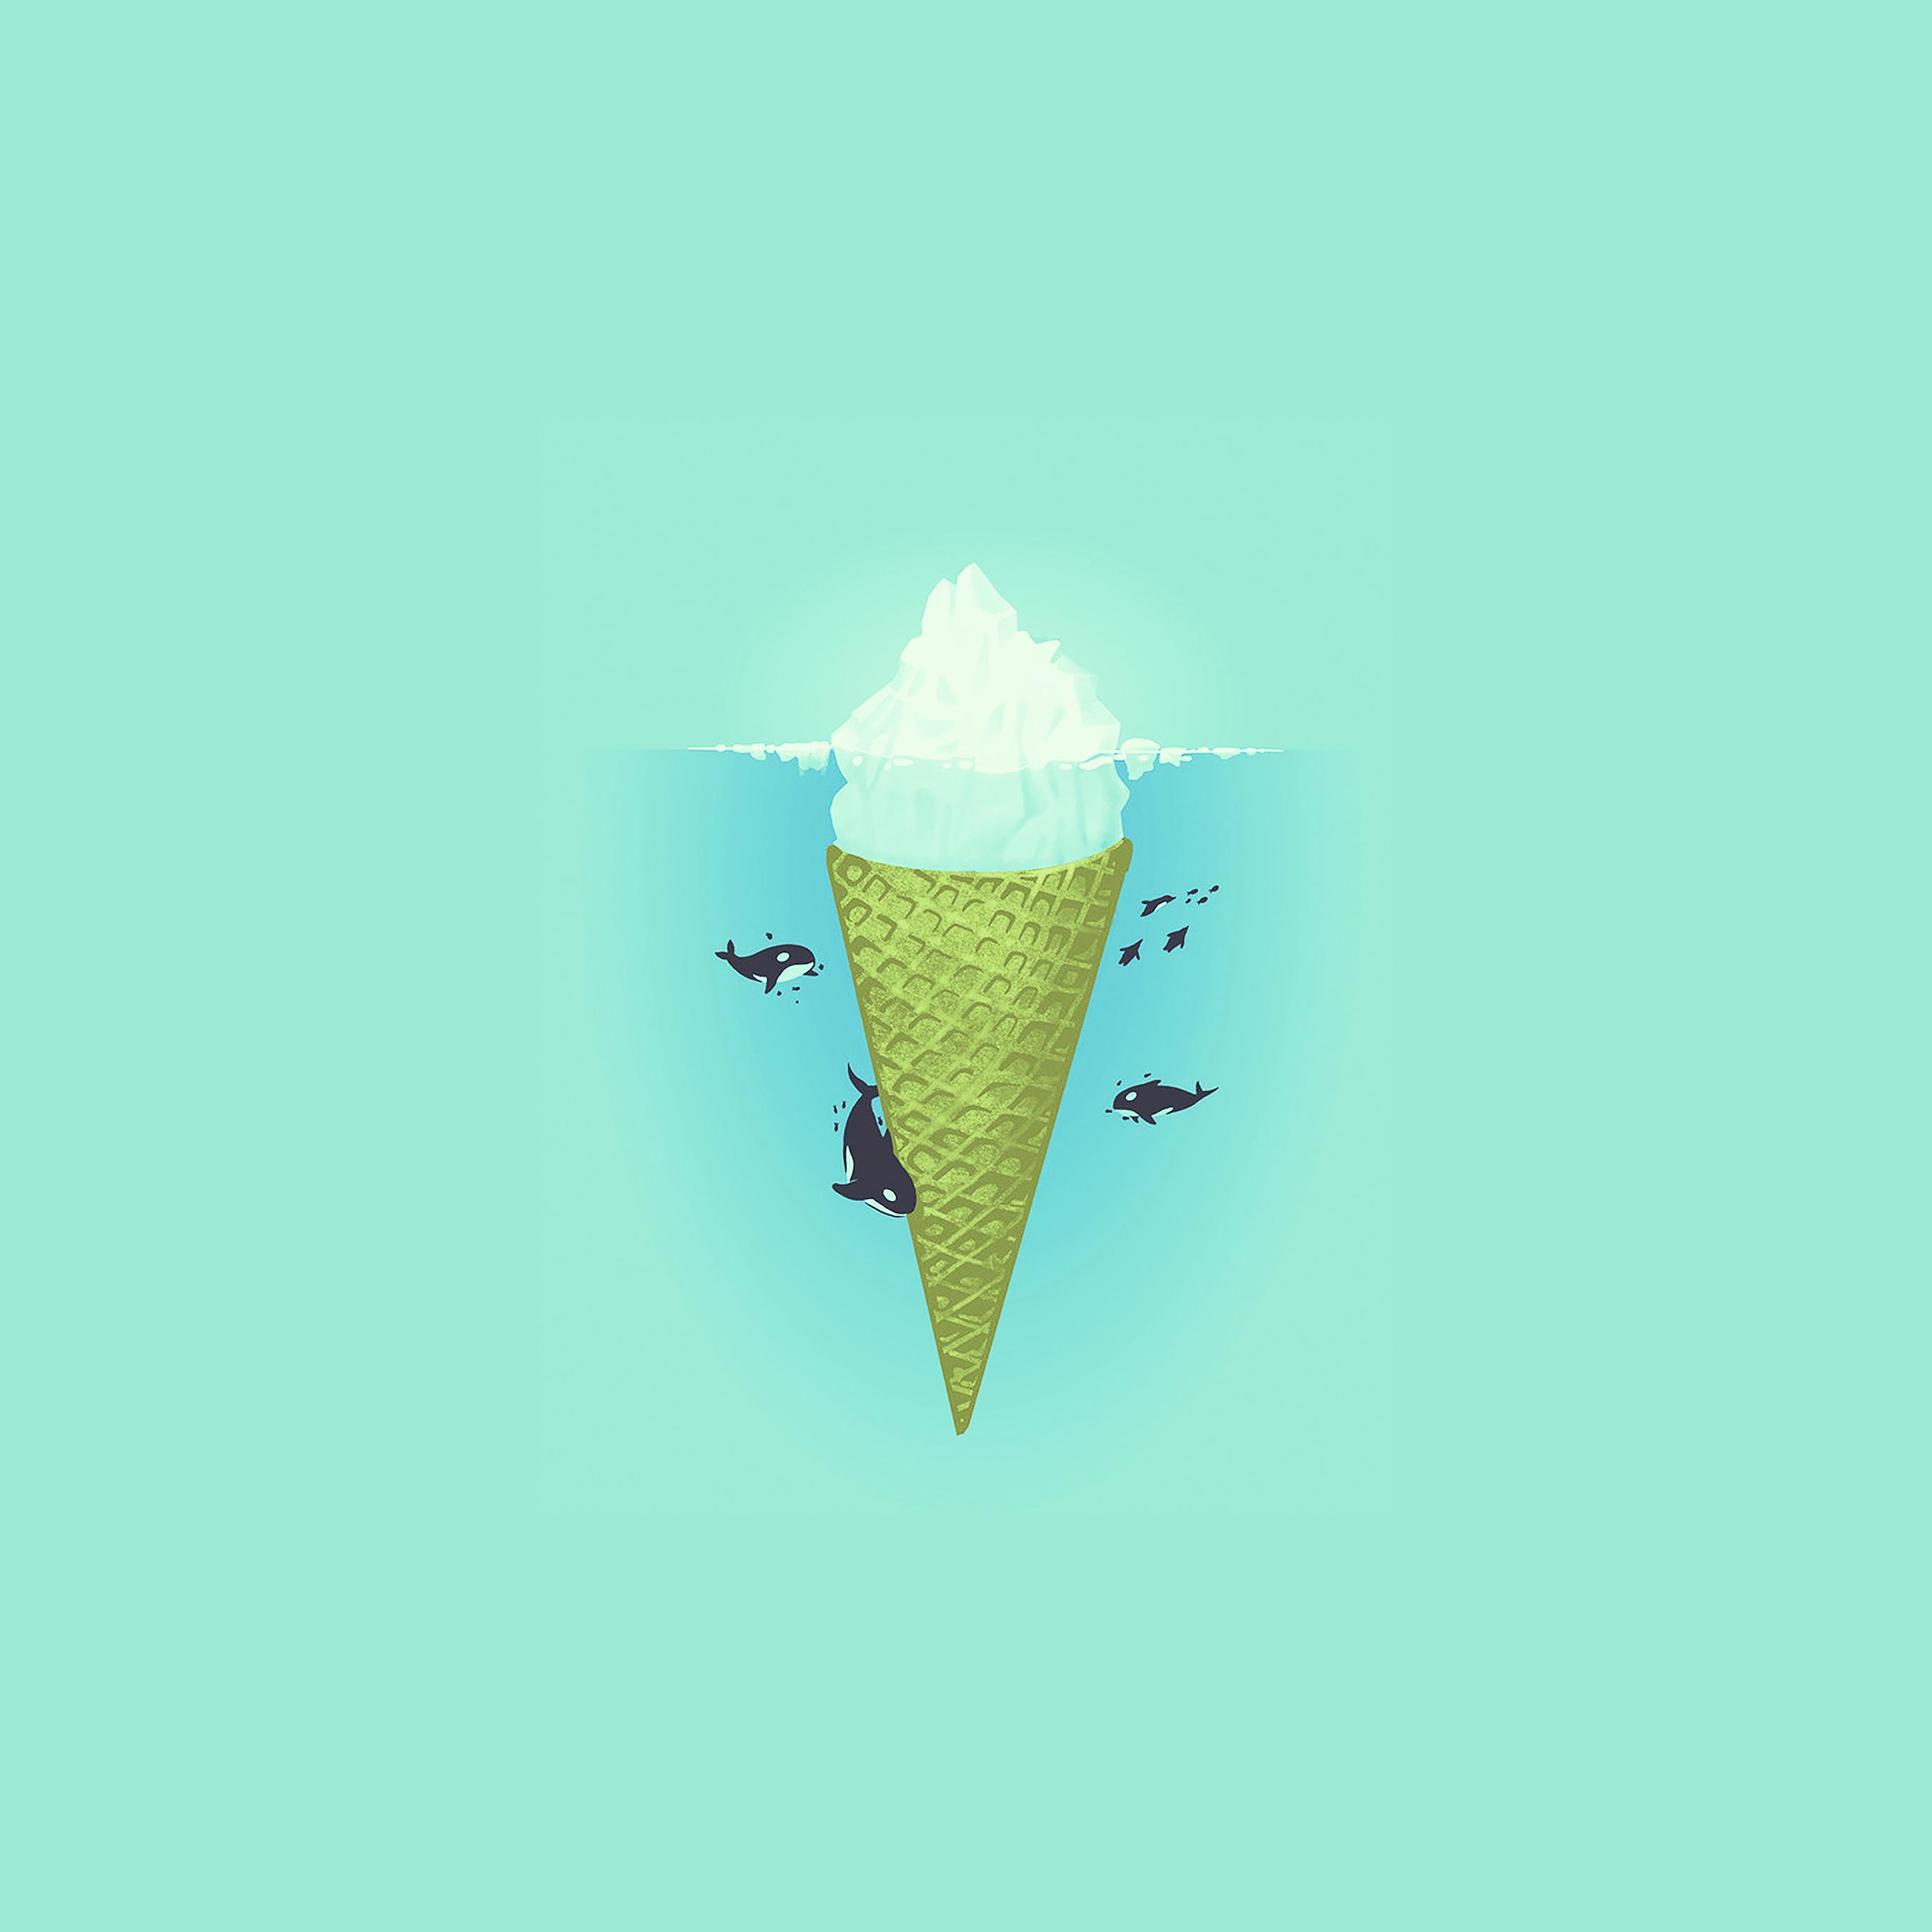 Ice Cream Wallpaper Hd: Ah80-whale-illust-green-sea-icecream-iceberg